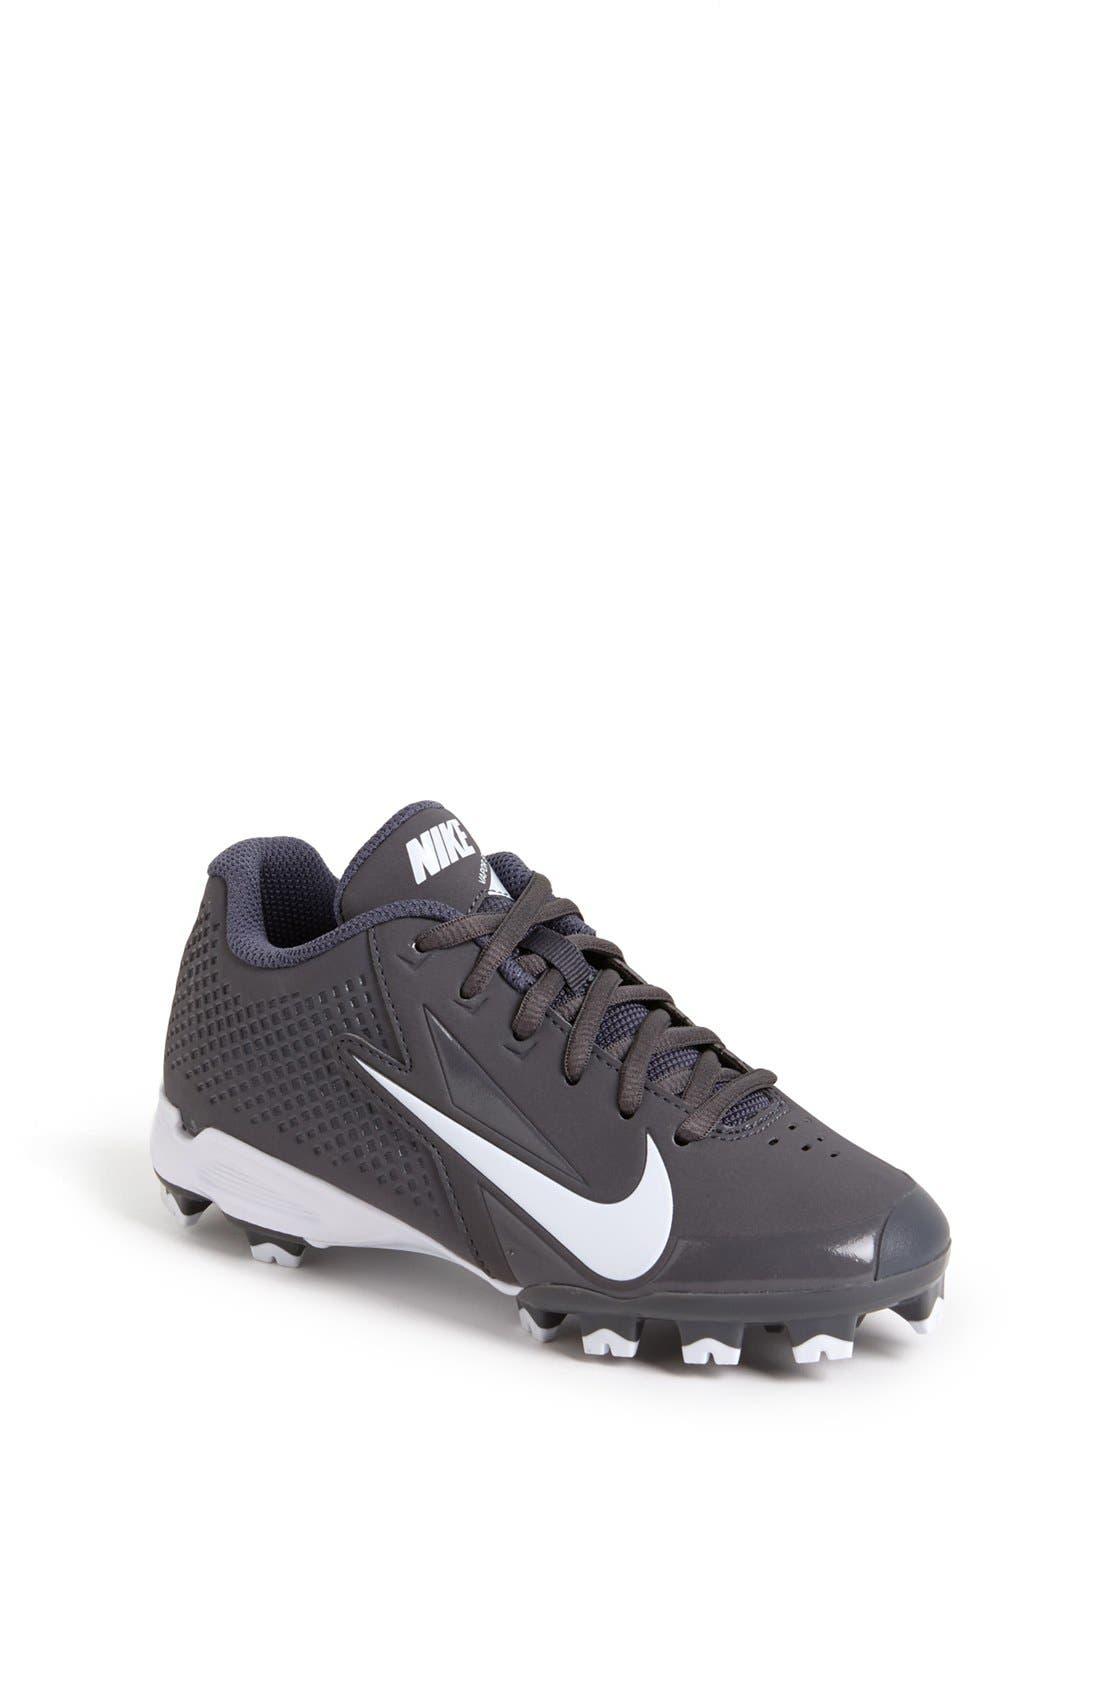 Alternate Image 1 Selected - Nike 'Vapor Strike' Baseball Shoe (Little Kid & Big Kid)